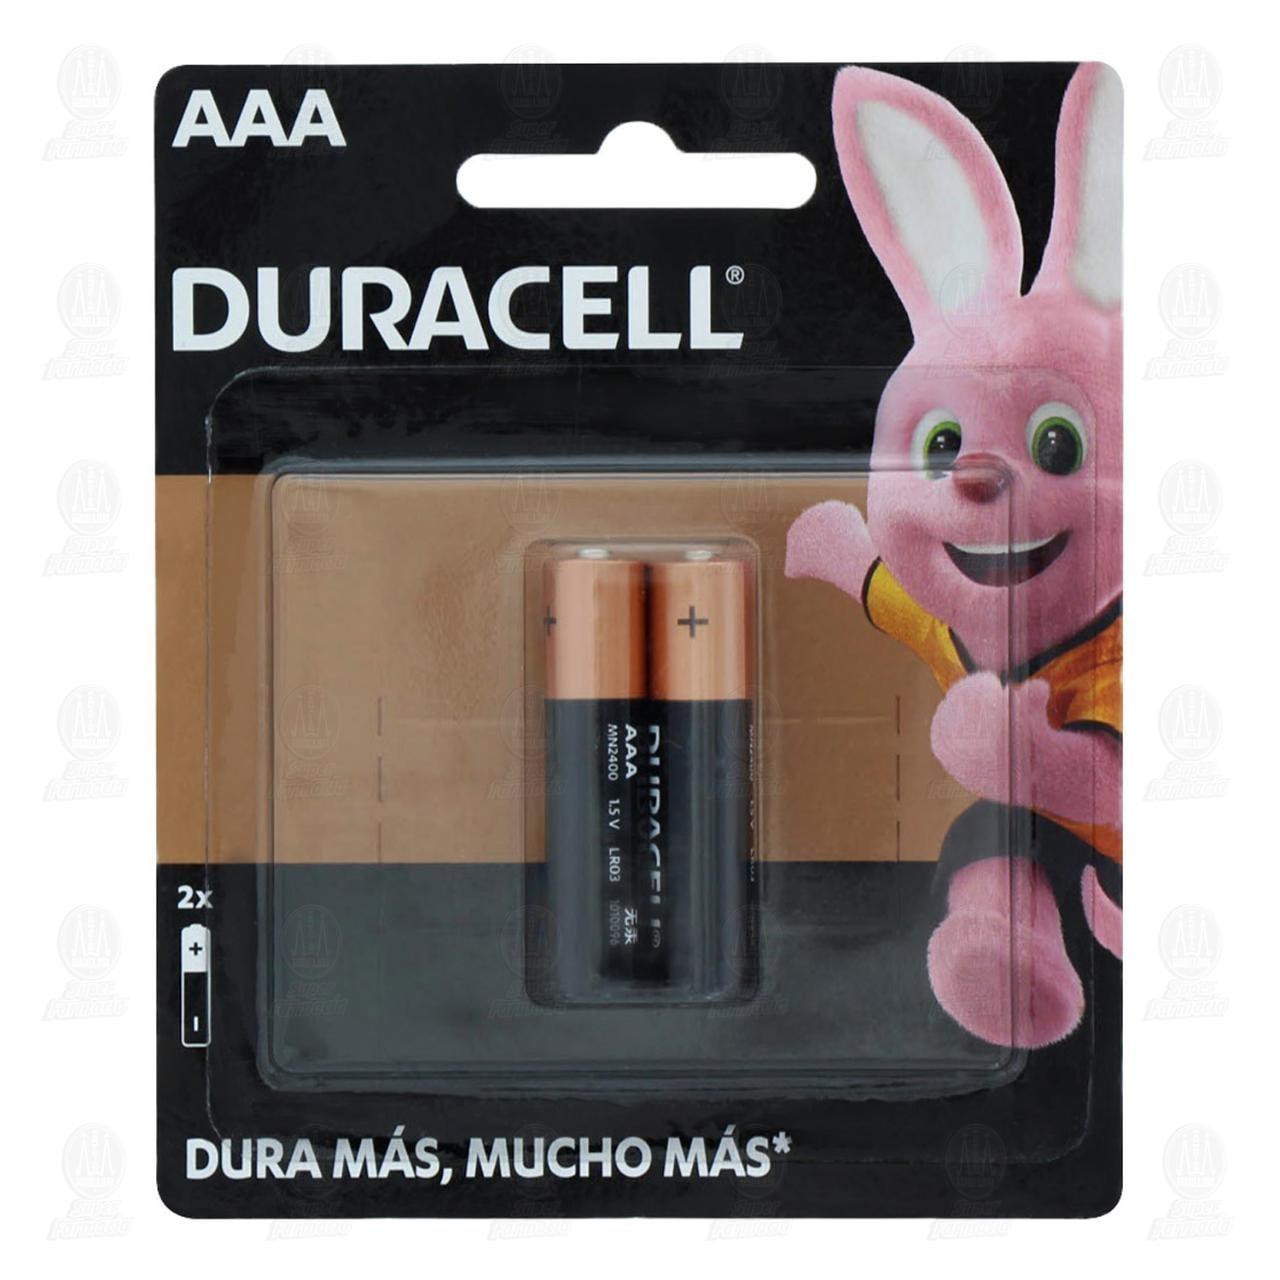 Comprar Pilas Duracell Alcalinas AAA, 2 pzas. en Farmacias Guadalajara